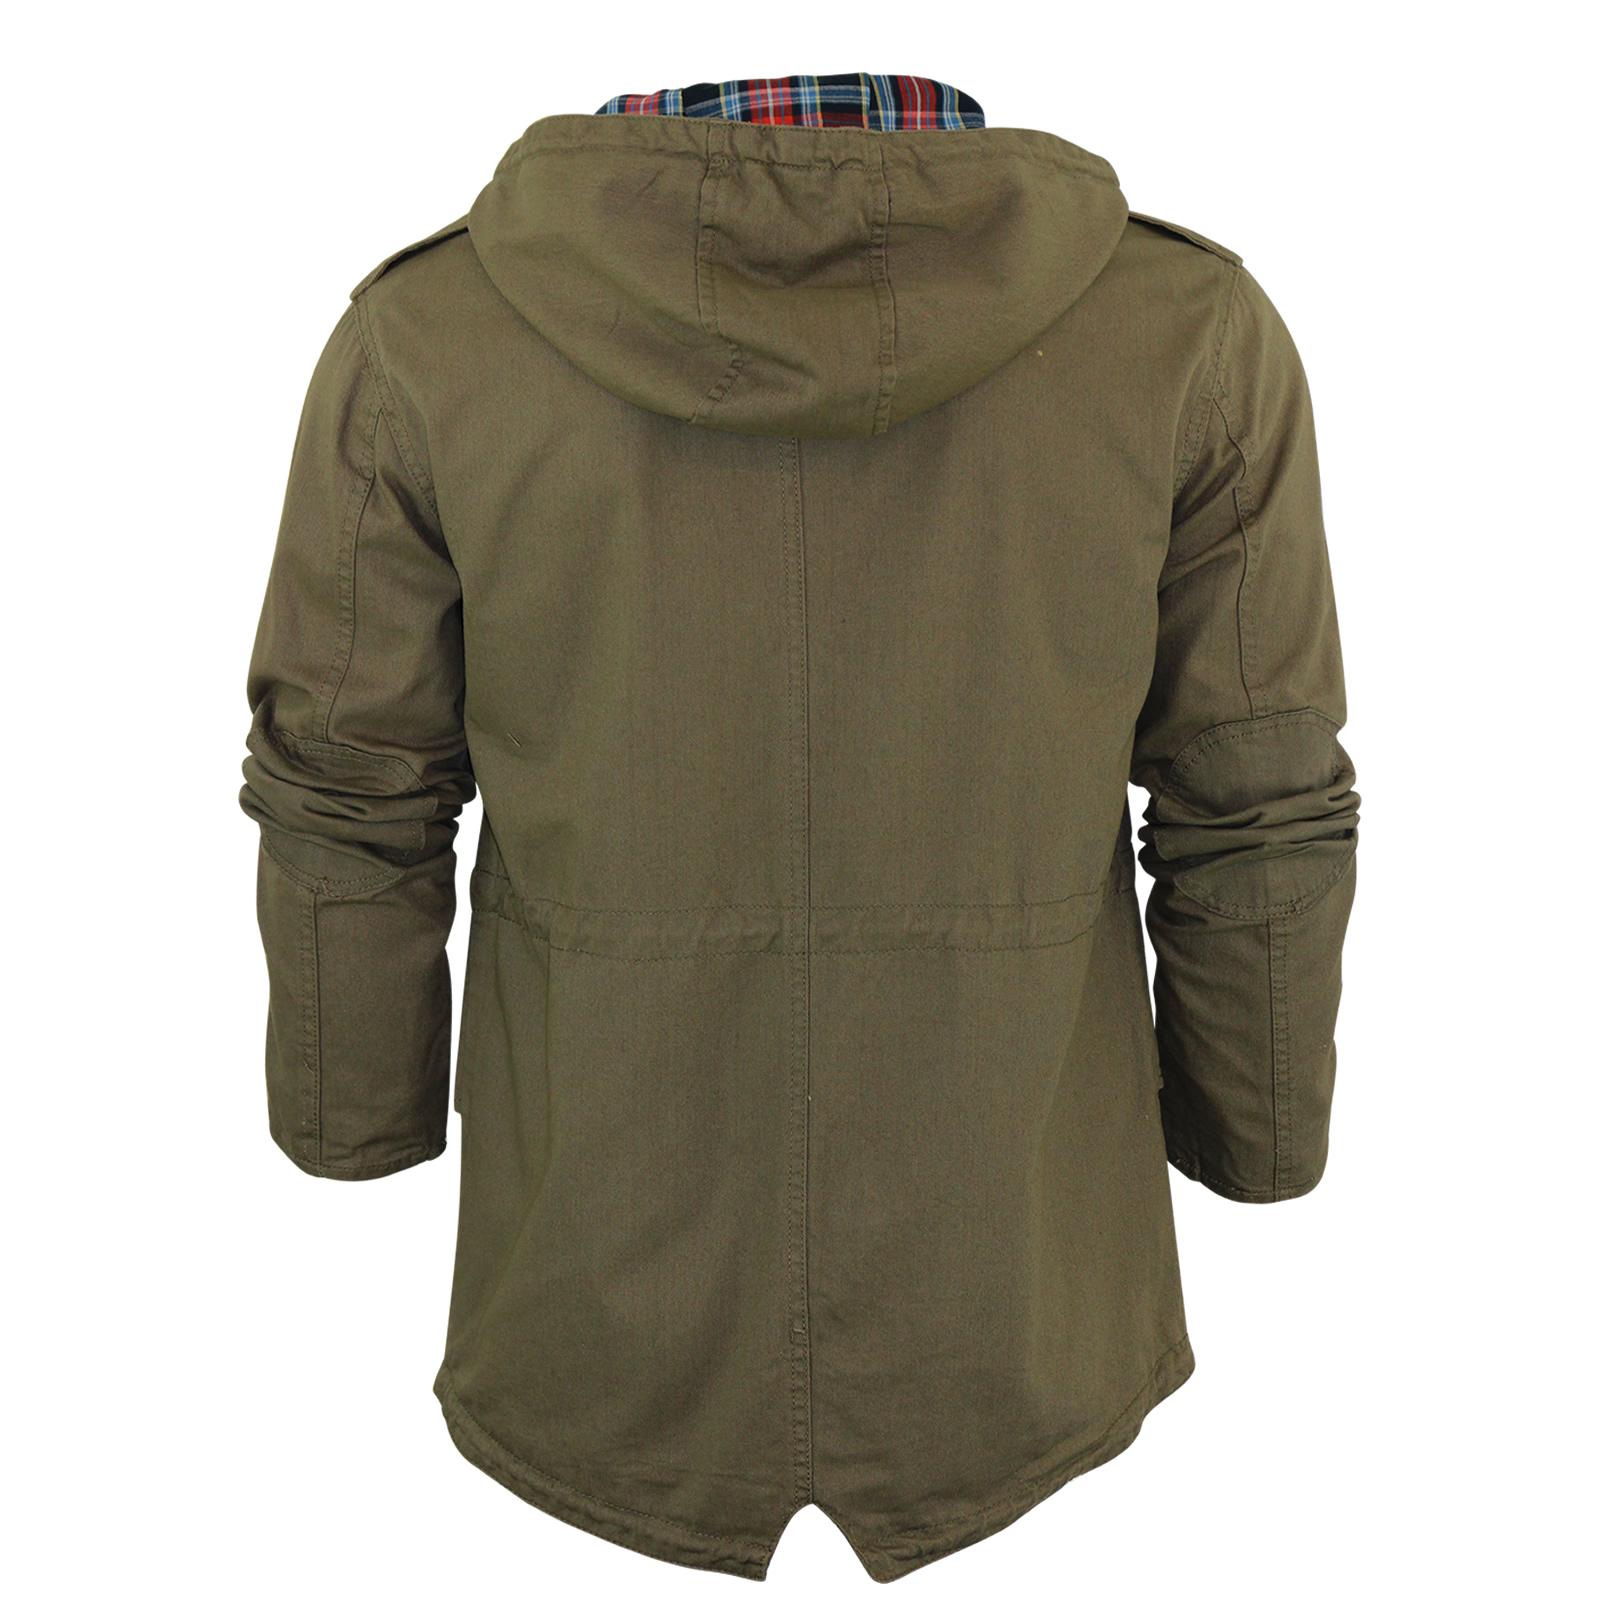 Mens Hooded Parka MOD Brave Soul Puzzle Jacket Coat Fishtail Military